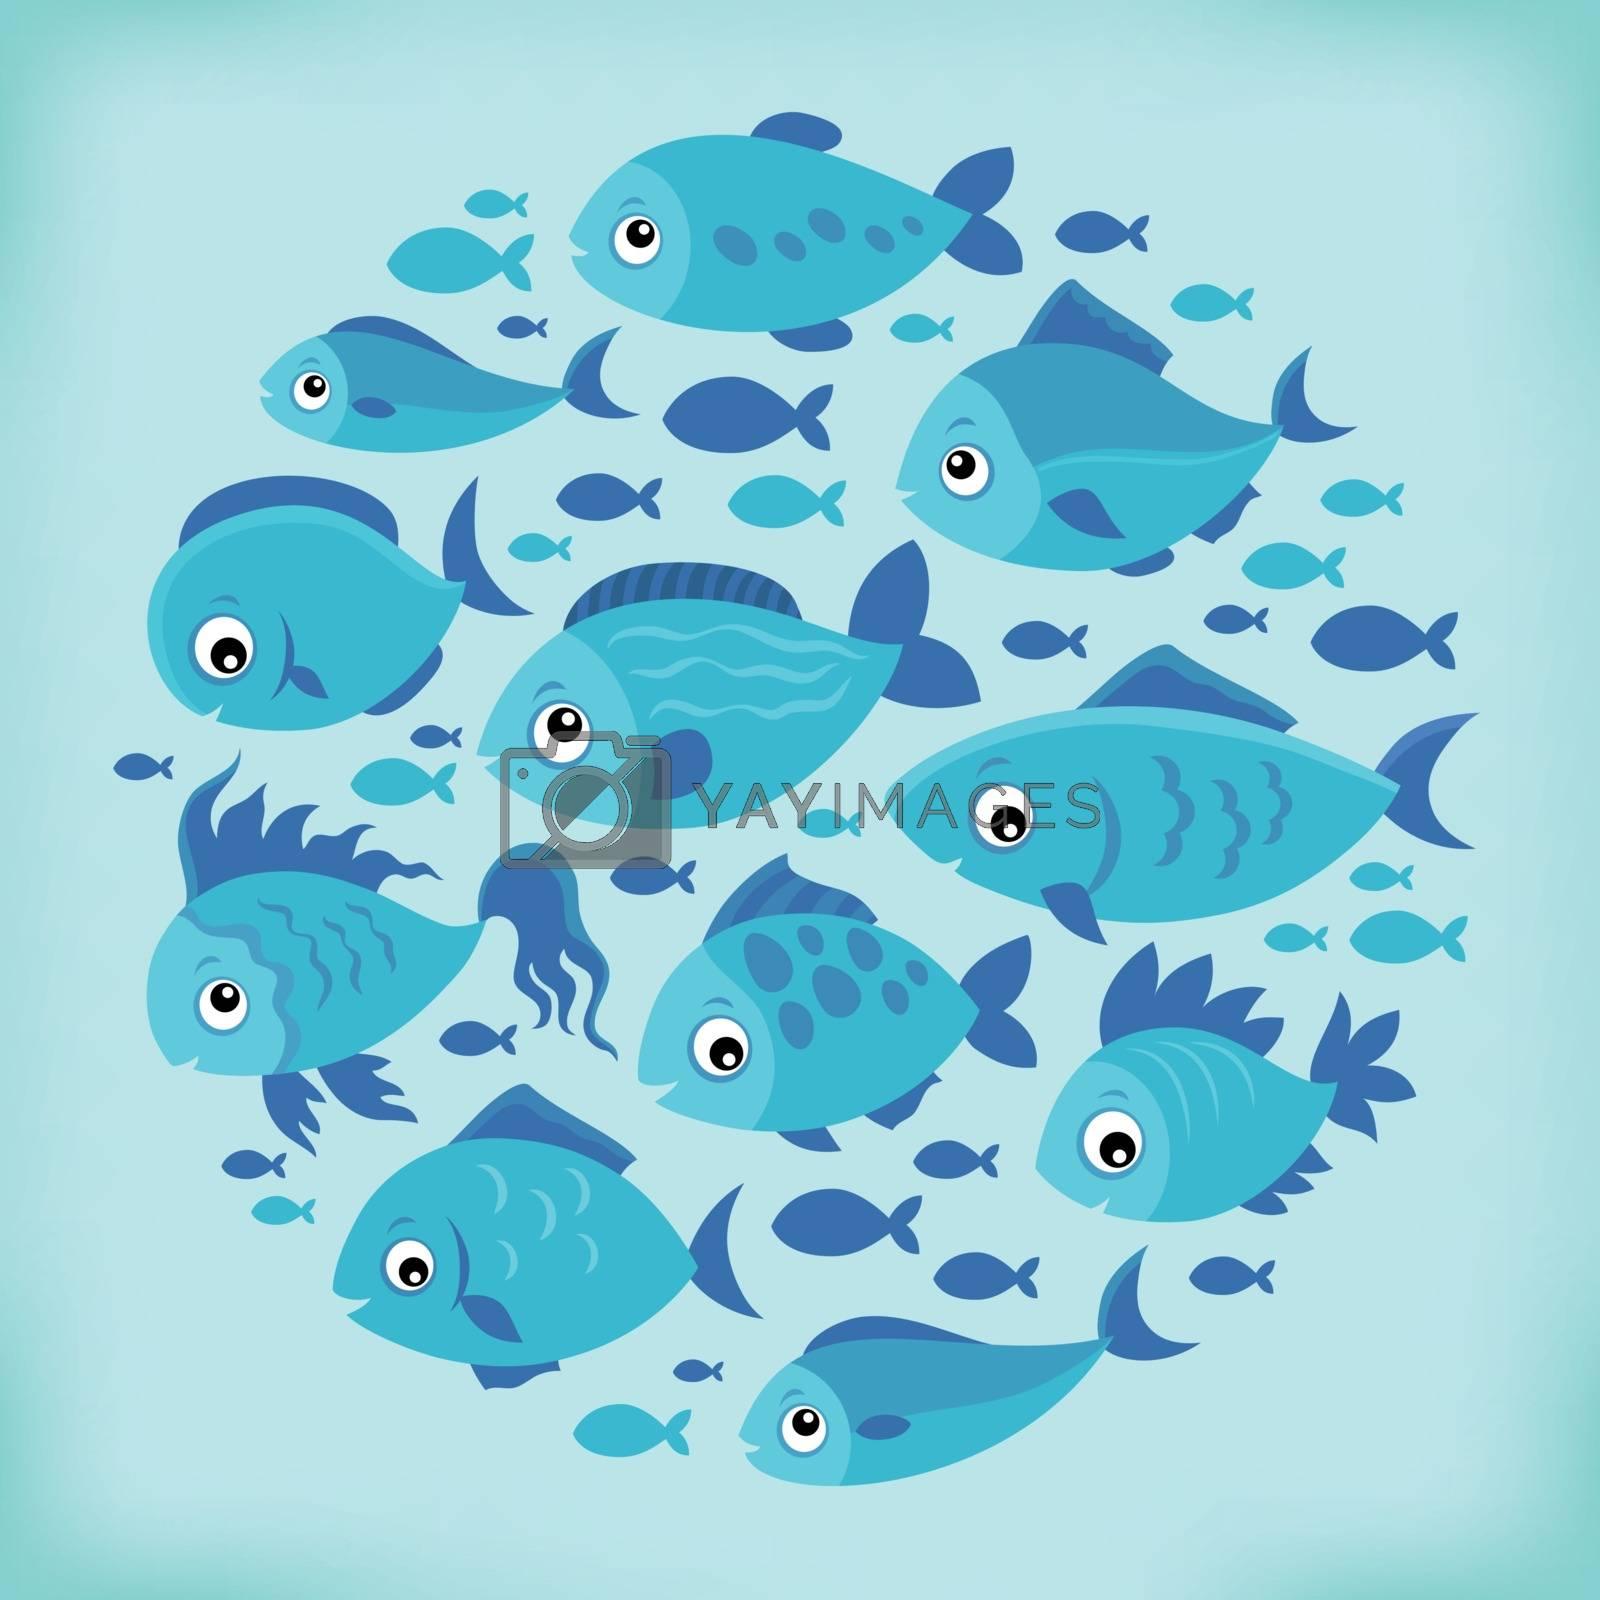 Stylized fishes topic image 4 - eps10 vector illustration.